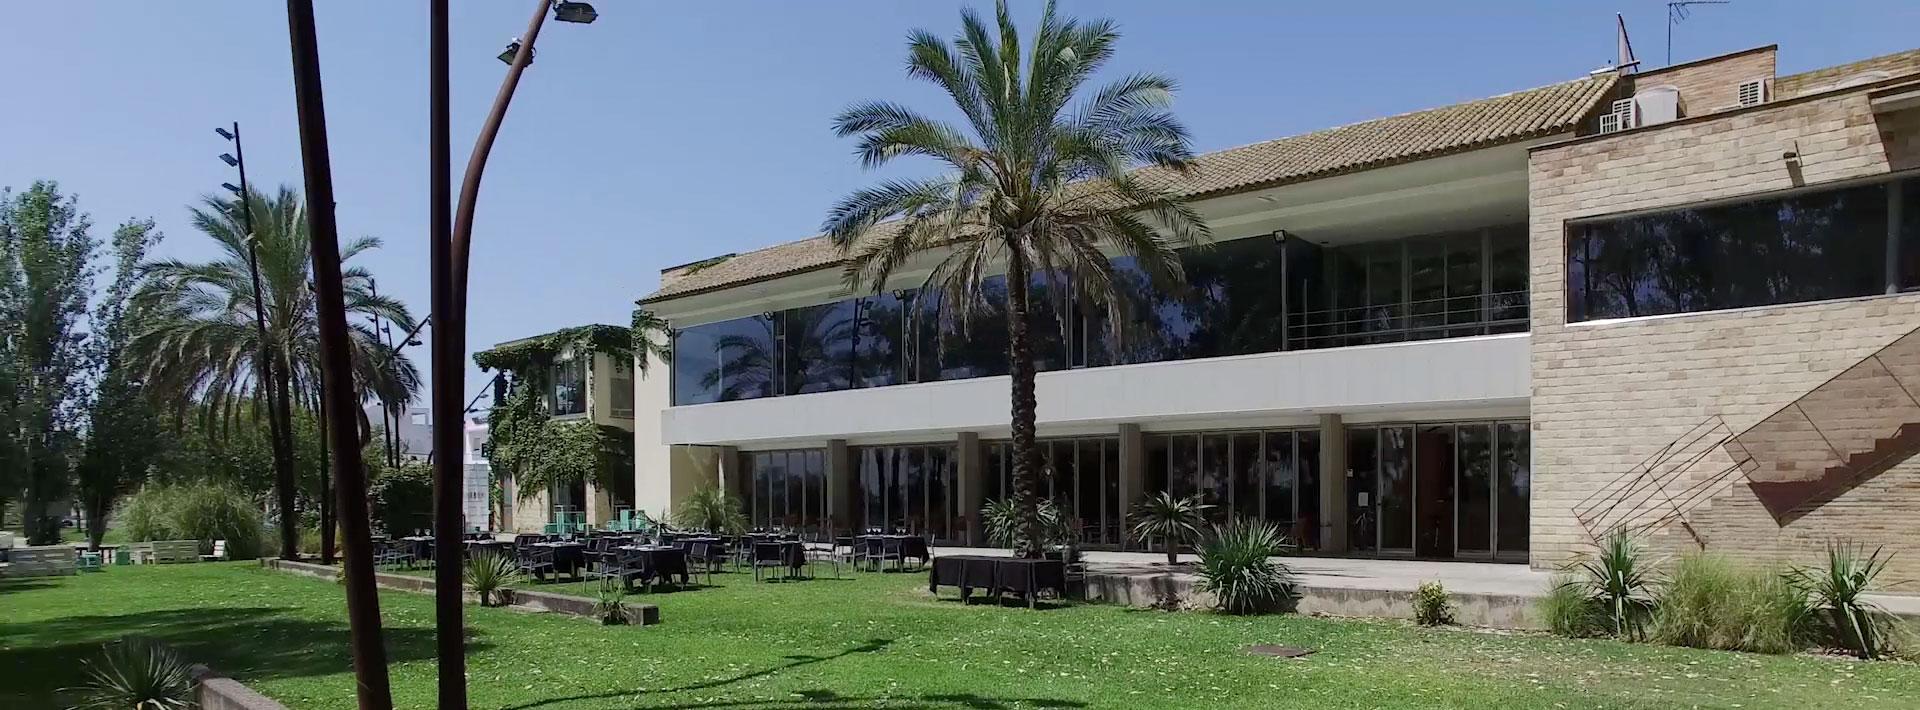 Cavia en Sevilla